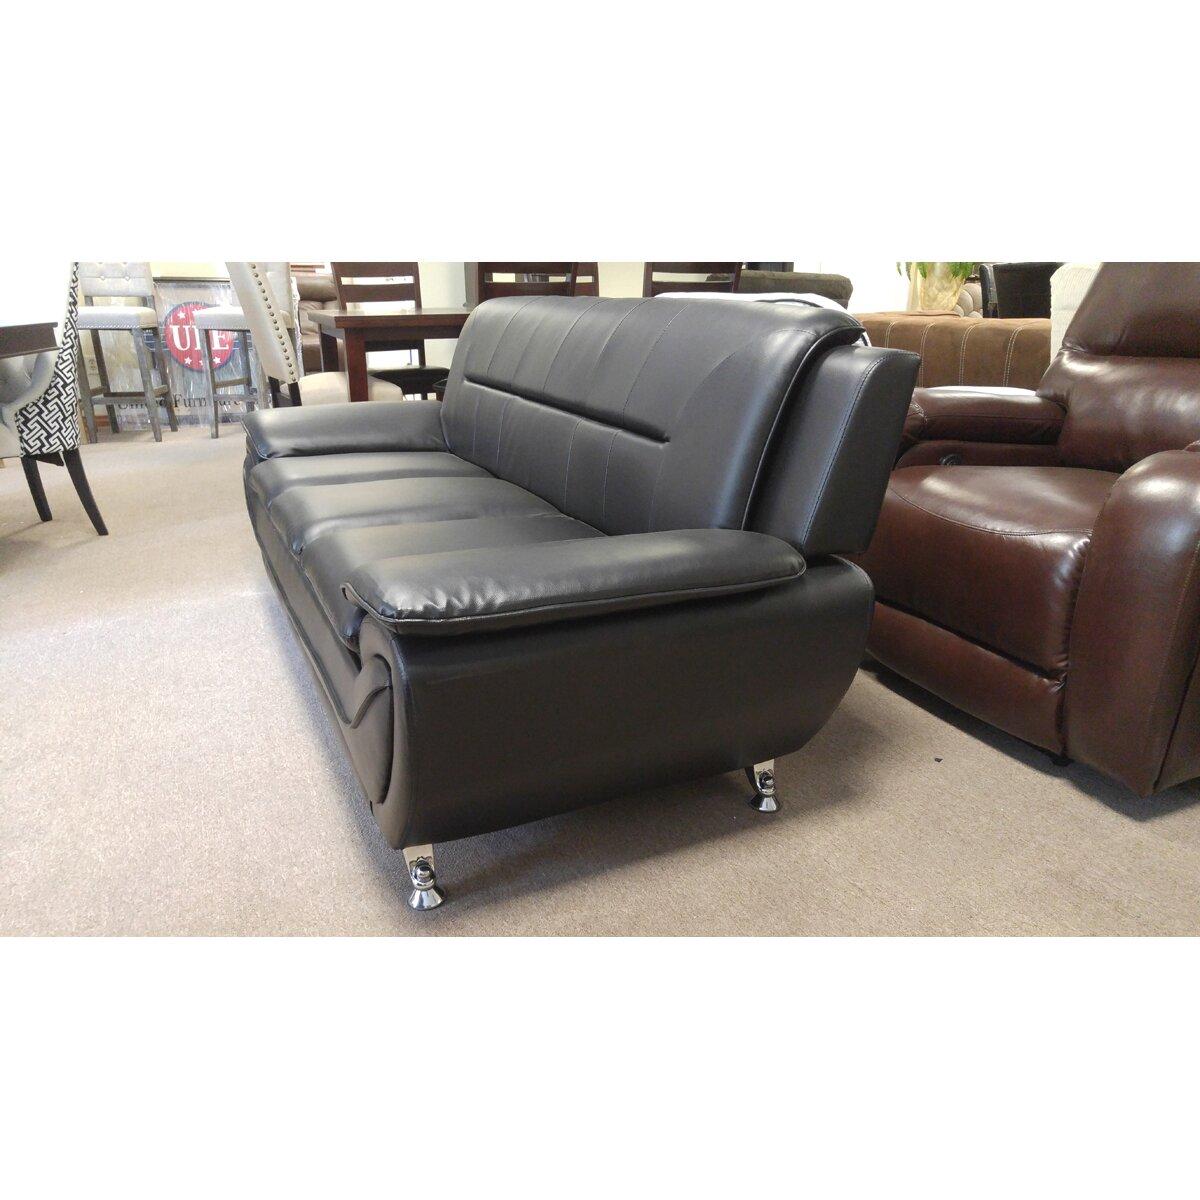 Furniture Living Room Furniture   Modern Sofas Living In Style SKU